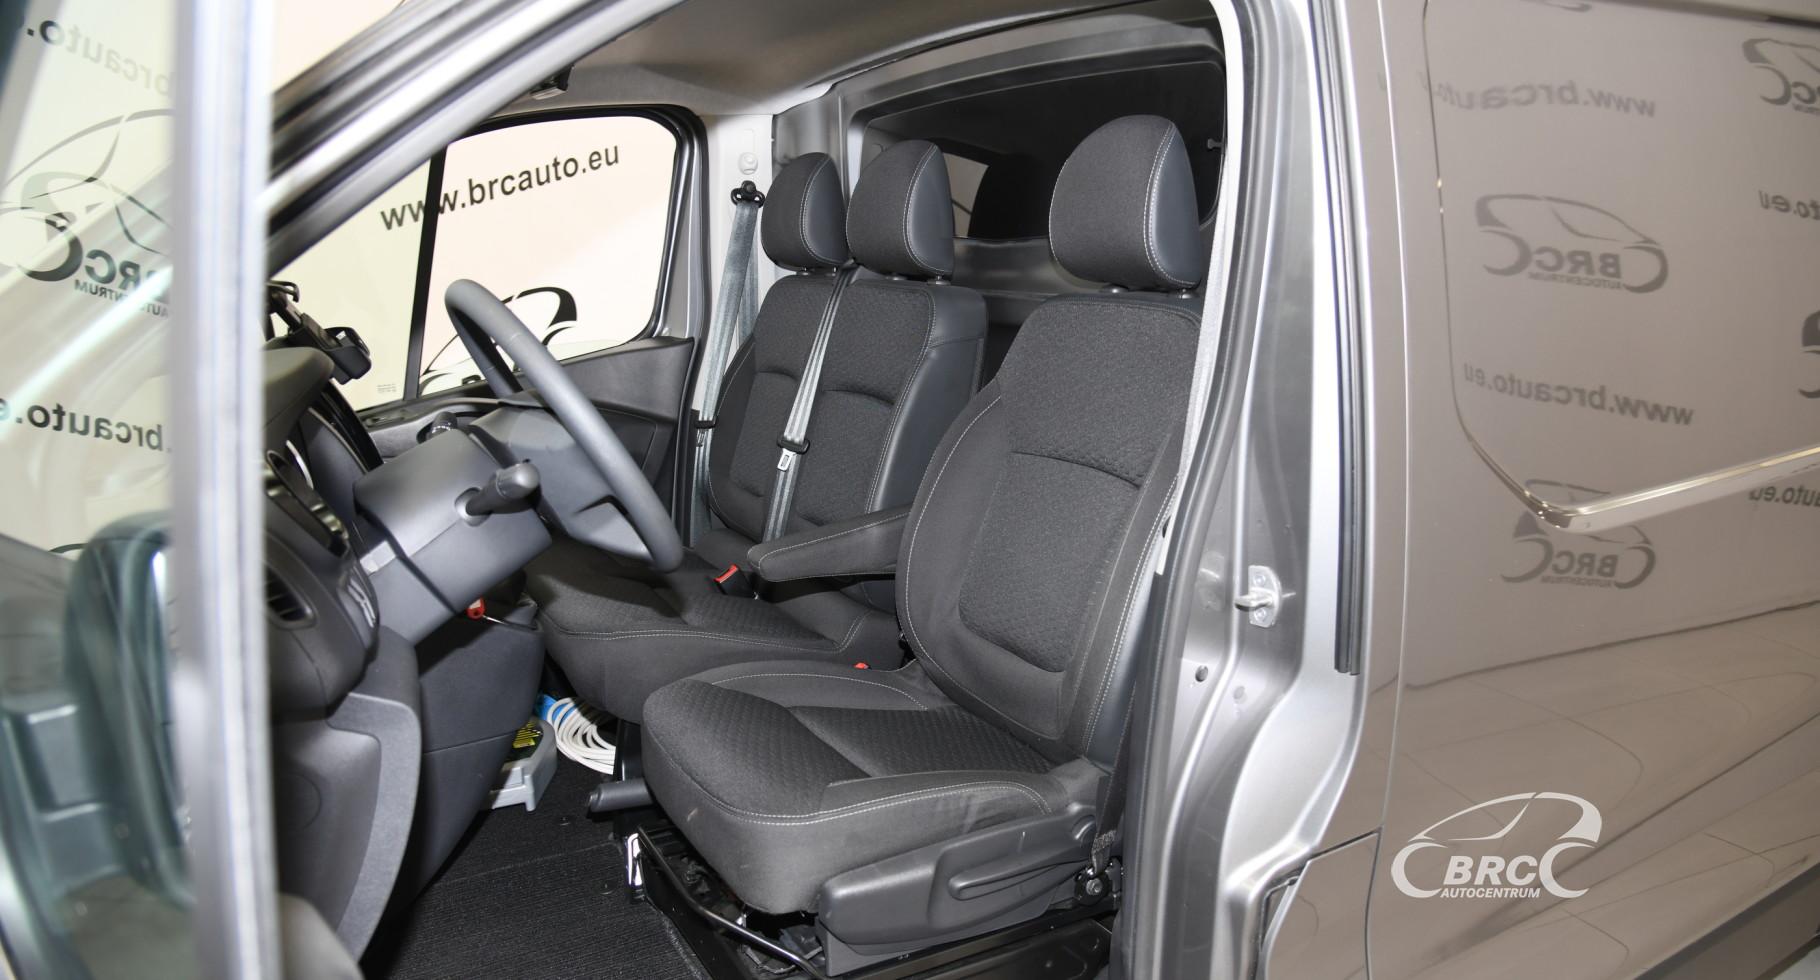 Opel Vivaro B 1.6 BiTurbo REF Termoking